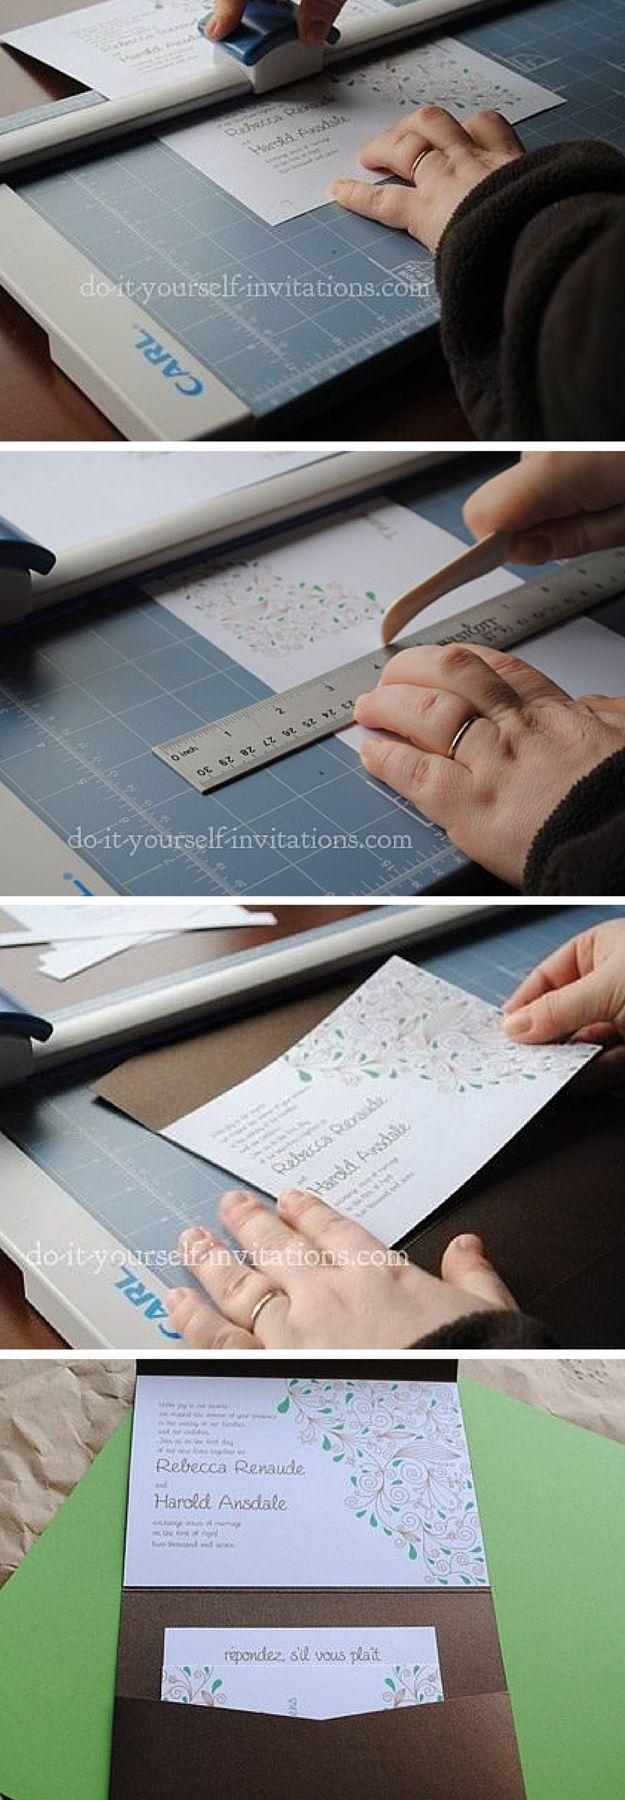 Do It Yourself Invitation Kit|DIY Wedding Invitation Kits,see more at: http://diyready.com/diy-wedding-invitation-kits/